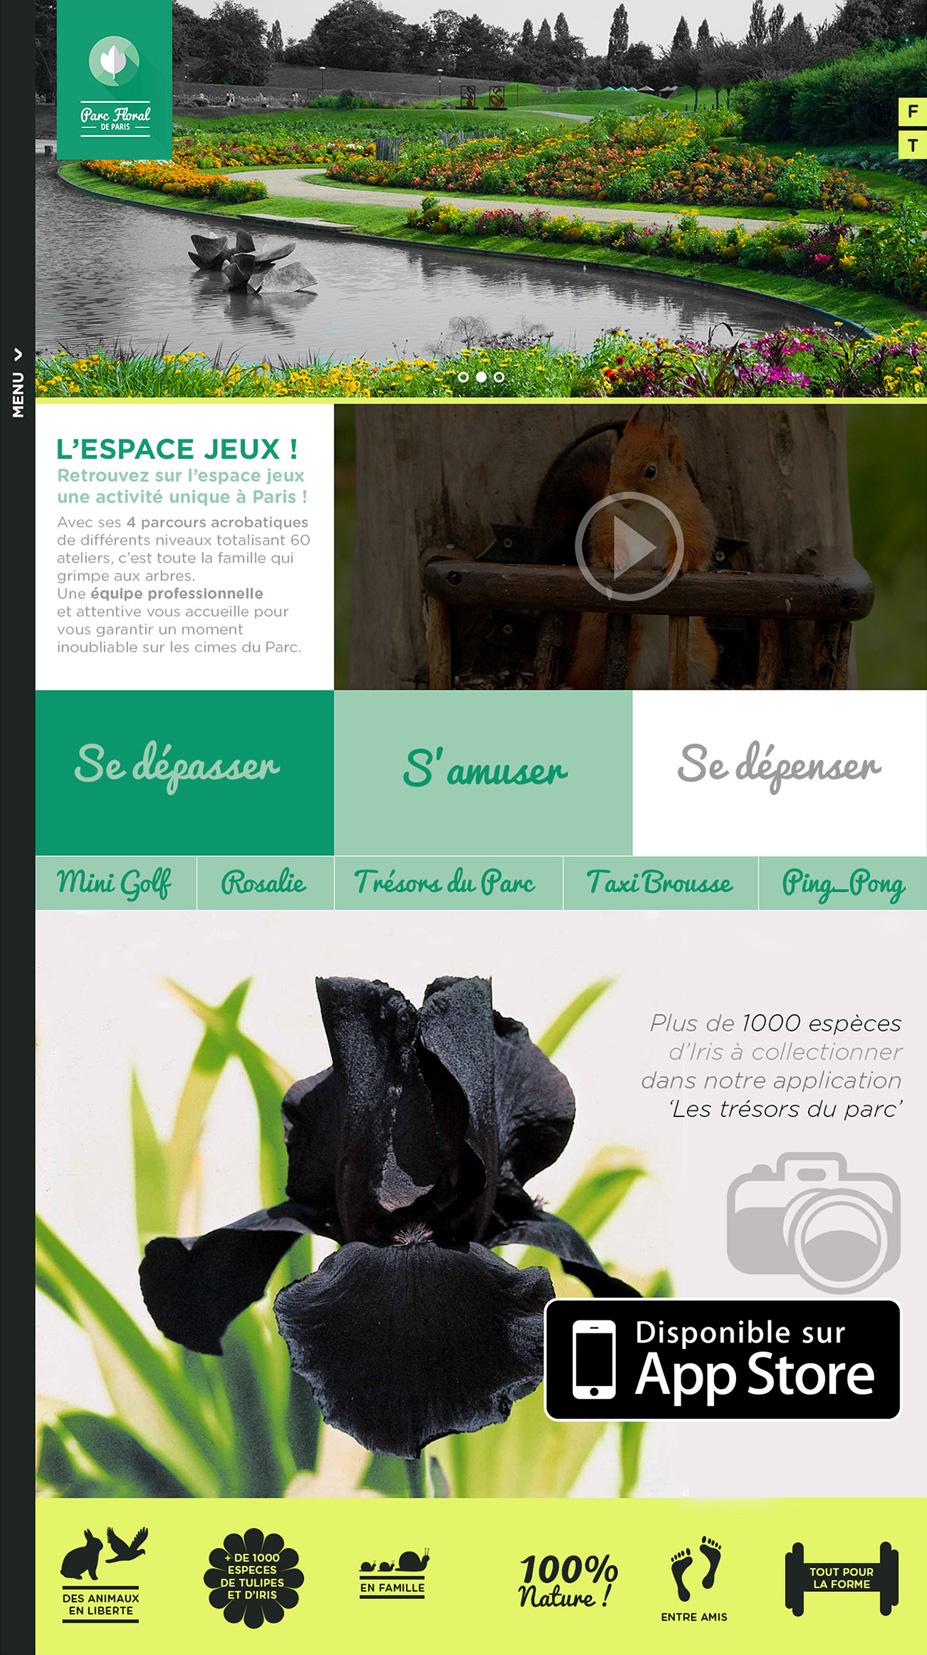 cecile_mirtin_parc_floral_interface_home_3.jpg